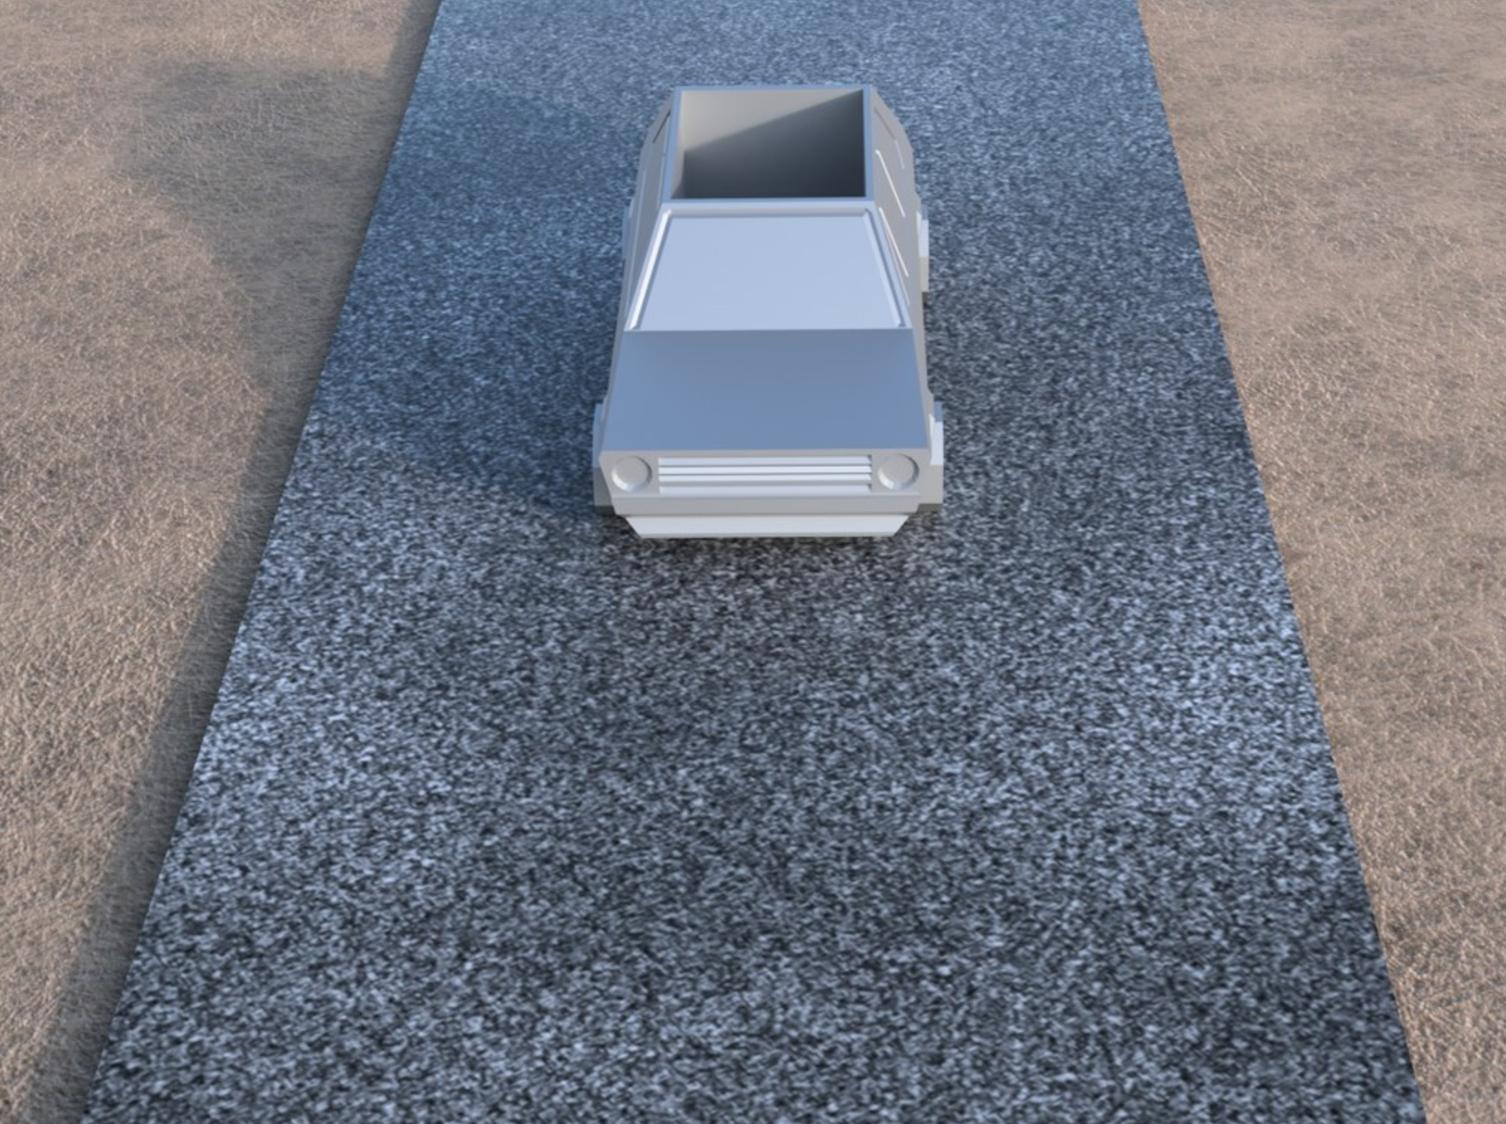 Capture d'écran 2017-05-31 à 19.52.31.png Download STL file Volkswagen Golf GTI - Low Poly Planter • 3D printer design, 3DPrintingGurus